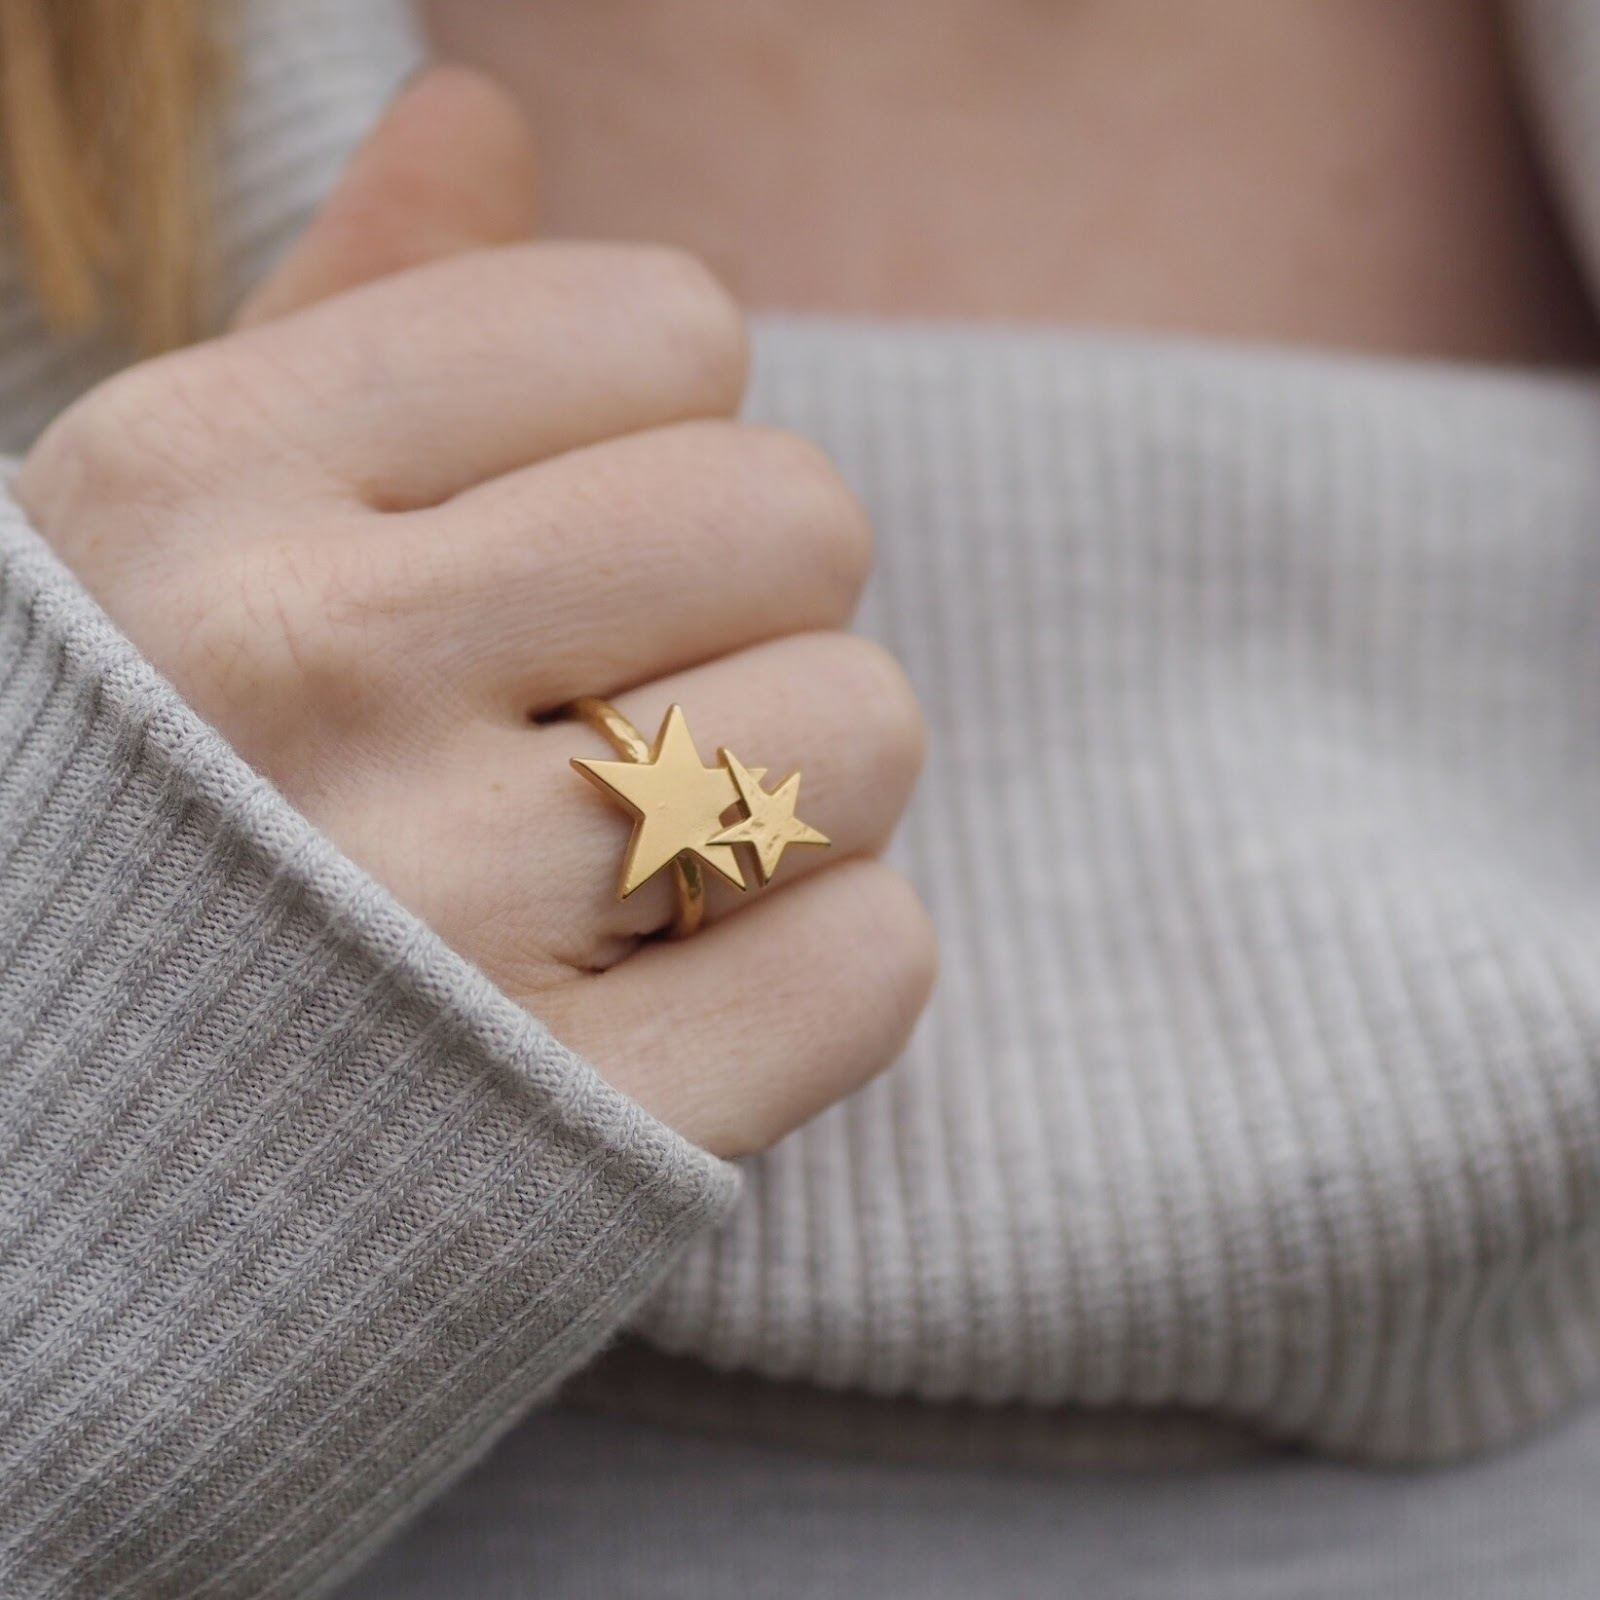 Danon jewellery gold stars ring